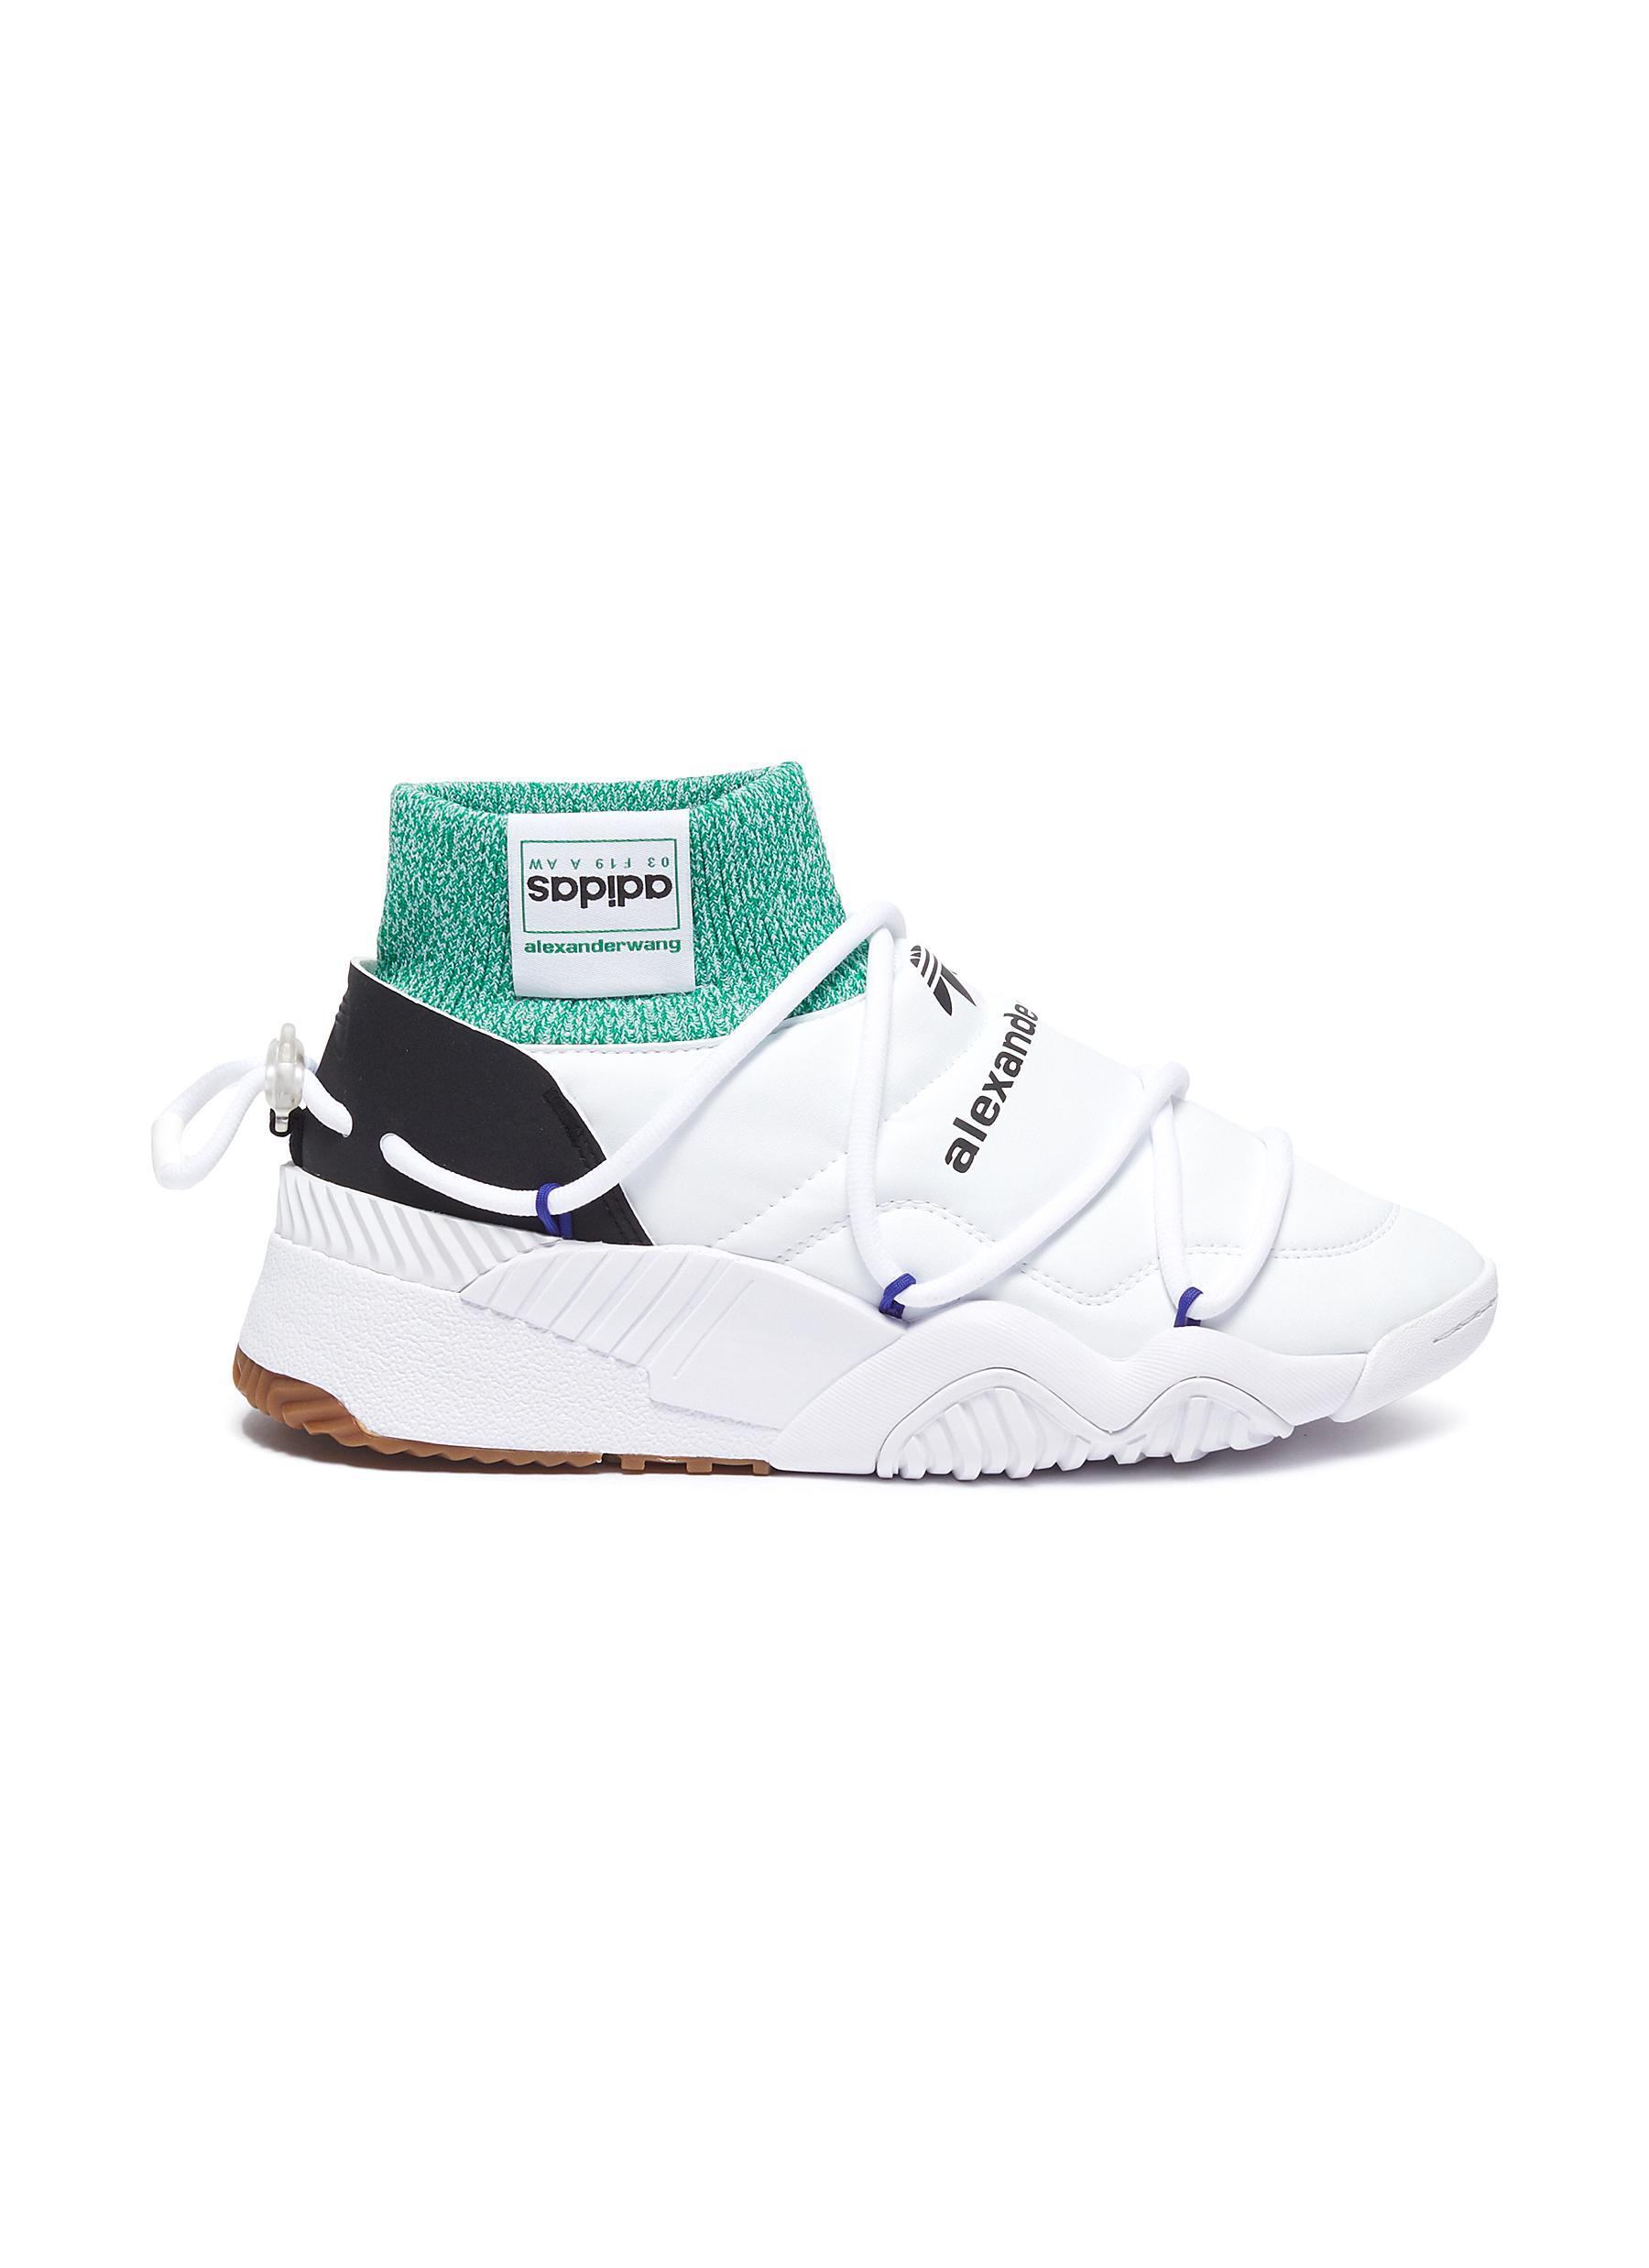 Adidas Originals By Alexander Wang Sneakers x ALEXANDERWANG puff sock liner sneakers